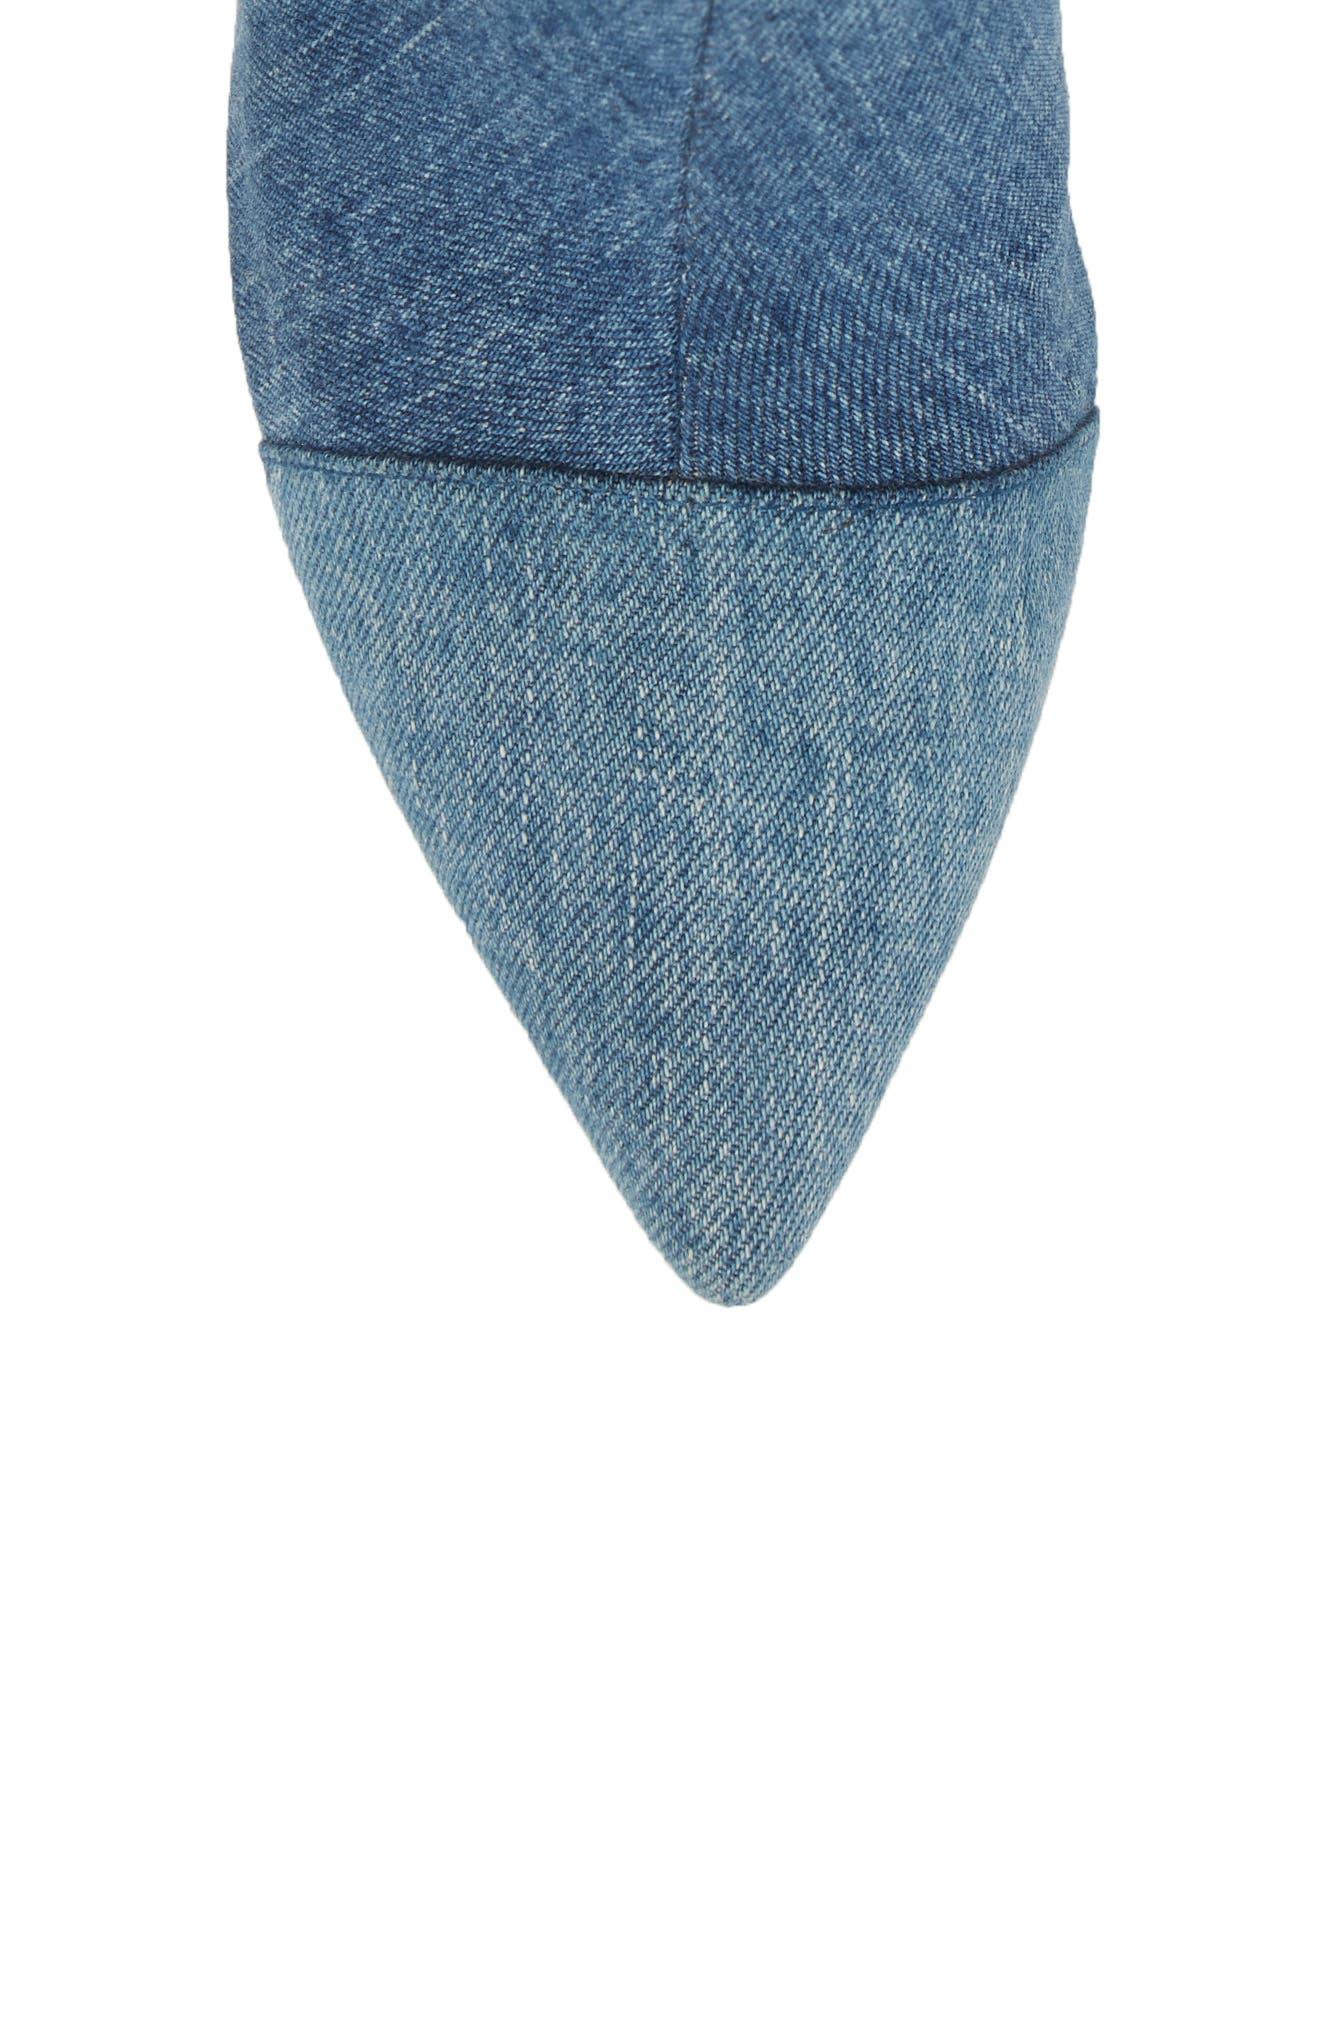 JEFFREY CAMPBELL, Finite Block Heel Bootie, Alternate thumbnail 5, color, BLUE DENIM